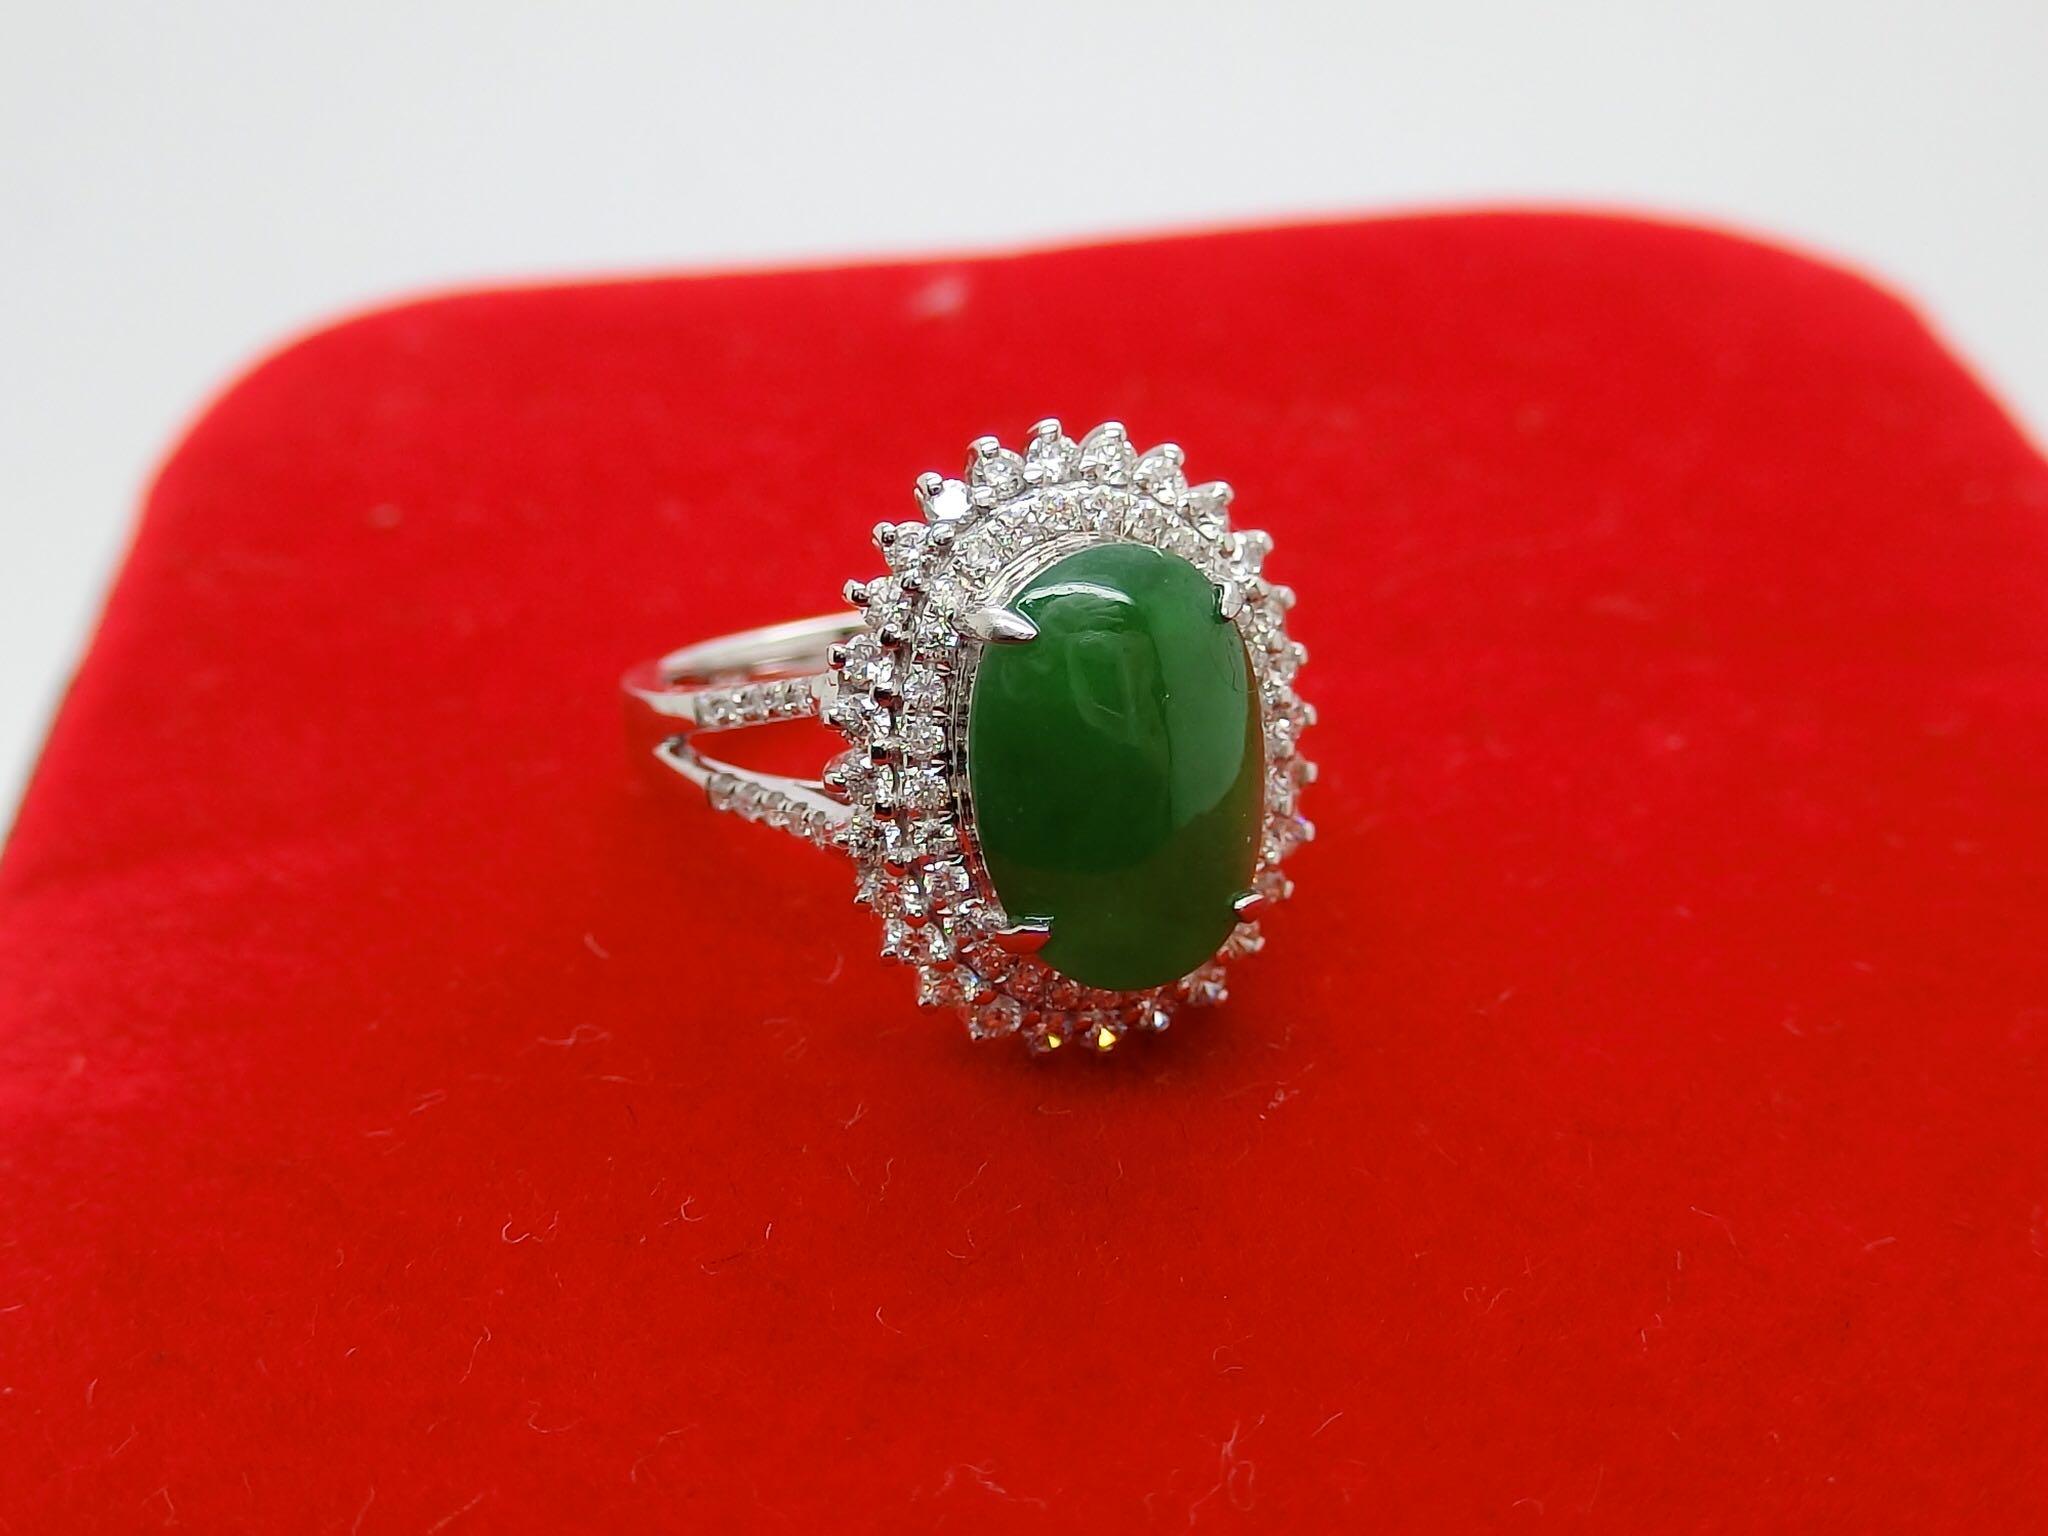 18K钻石翡翠彩宝珊瑚珍珠碧玺欧泊戒指吊坠手链镶嵌首饰加工定制